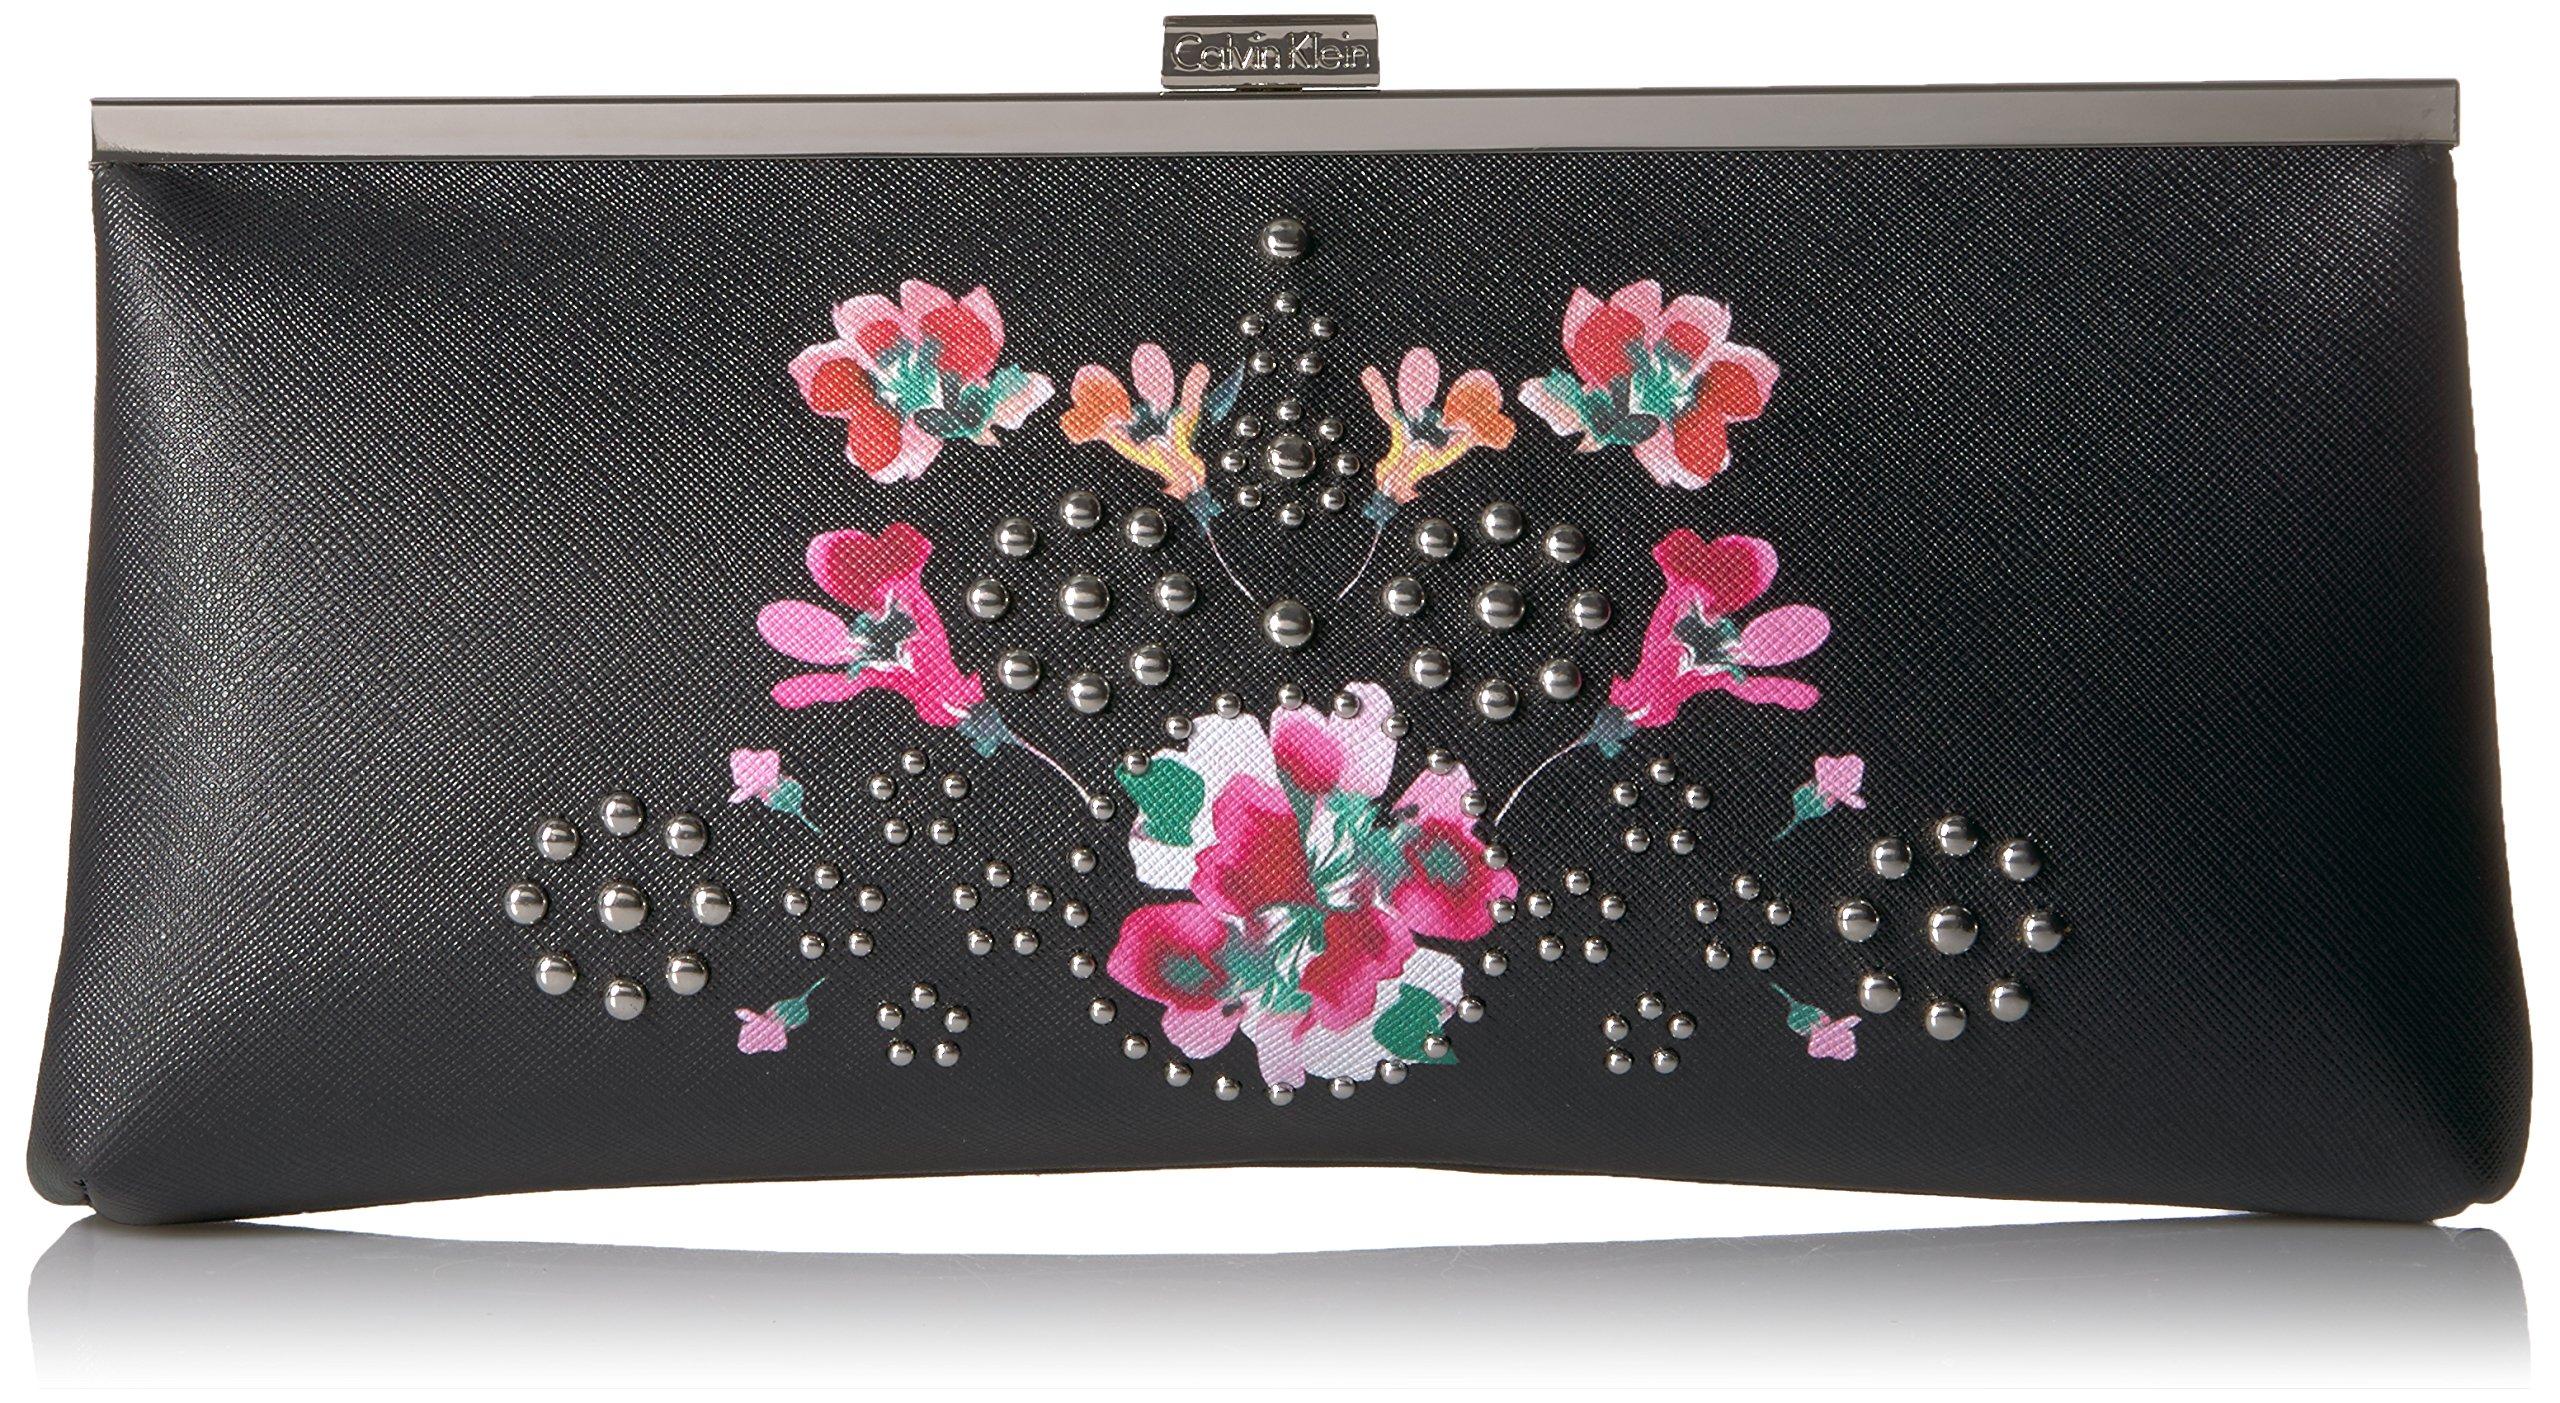 Calvin Klein Floral Printed Saffiano Clutch